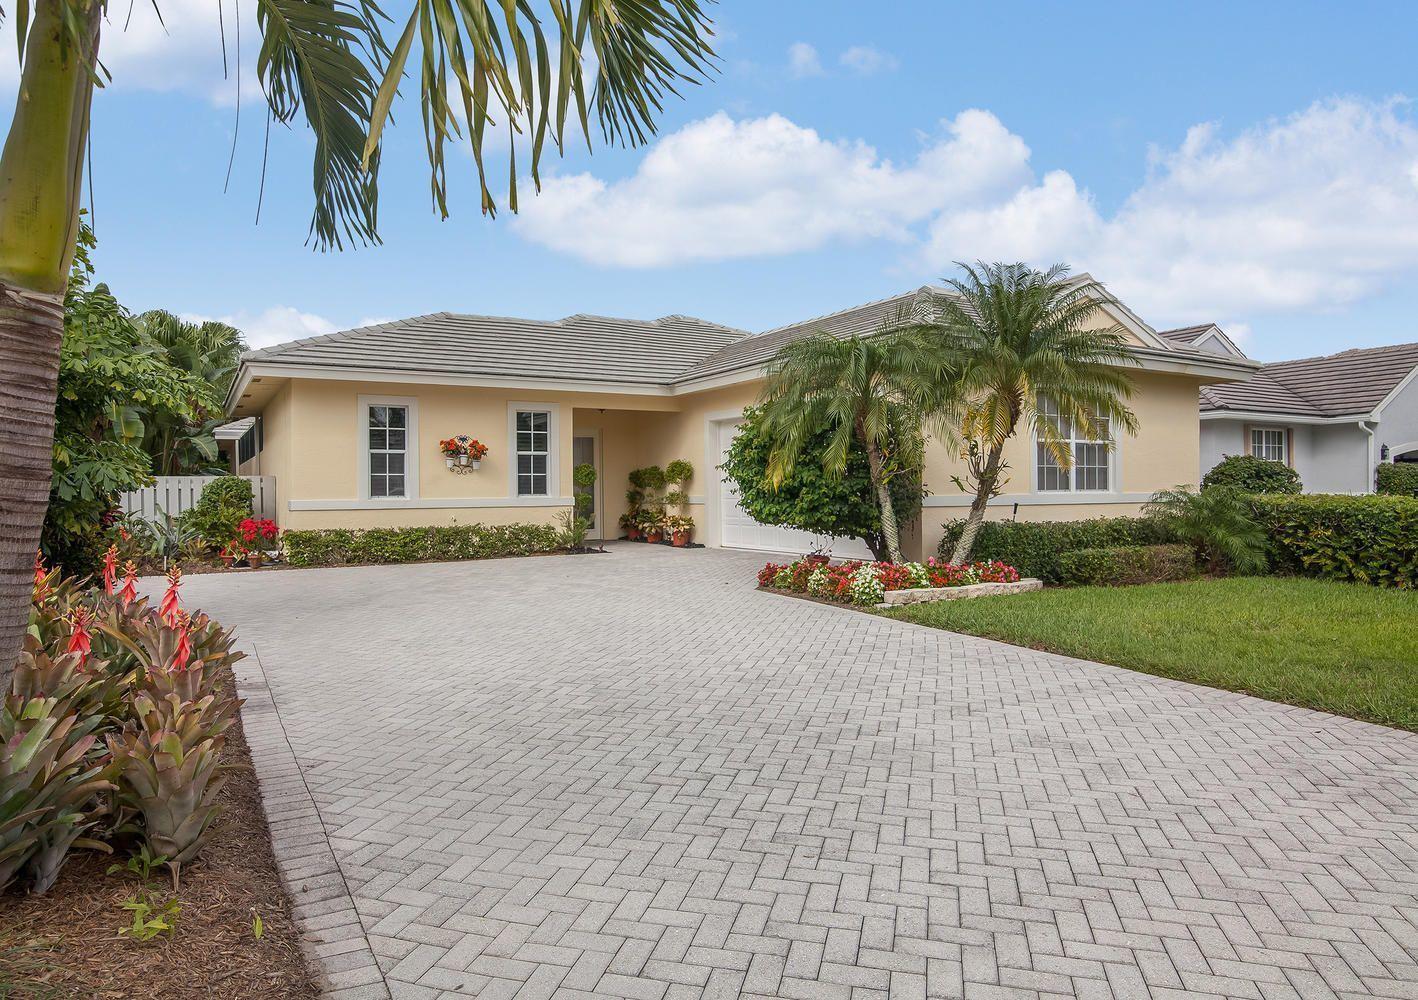 8269 Bob O Link Drive, West Palm Beach, Florida 33412, 3 Bedrooms Bedrooms, ,4 BathroomsBathrooms,A,Single family,Bob O Link,RX-10700459